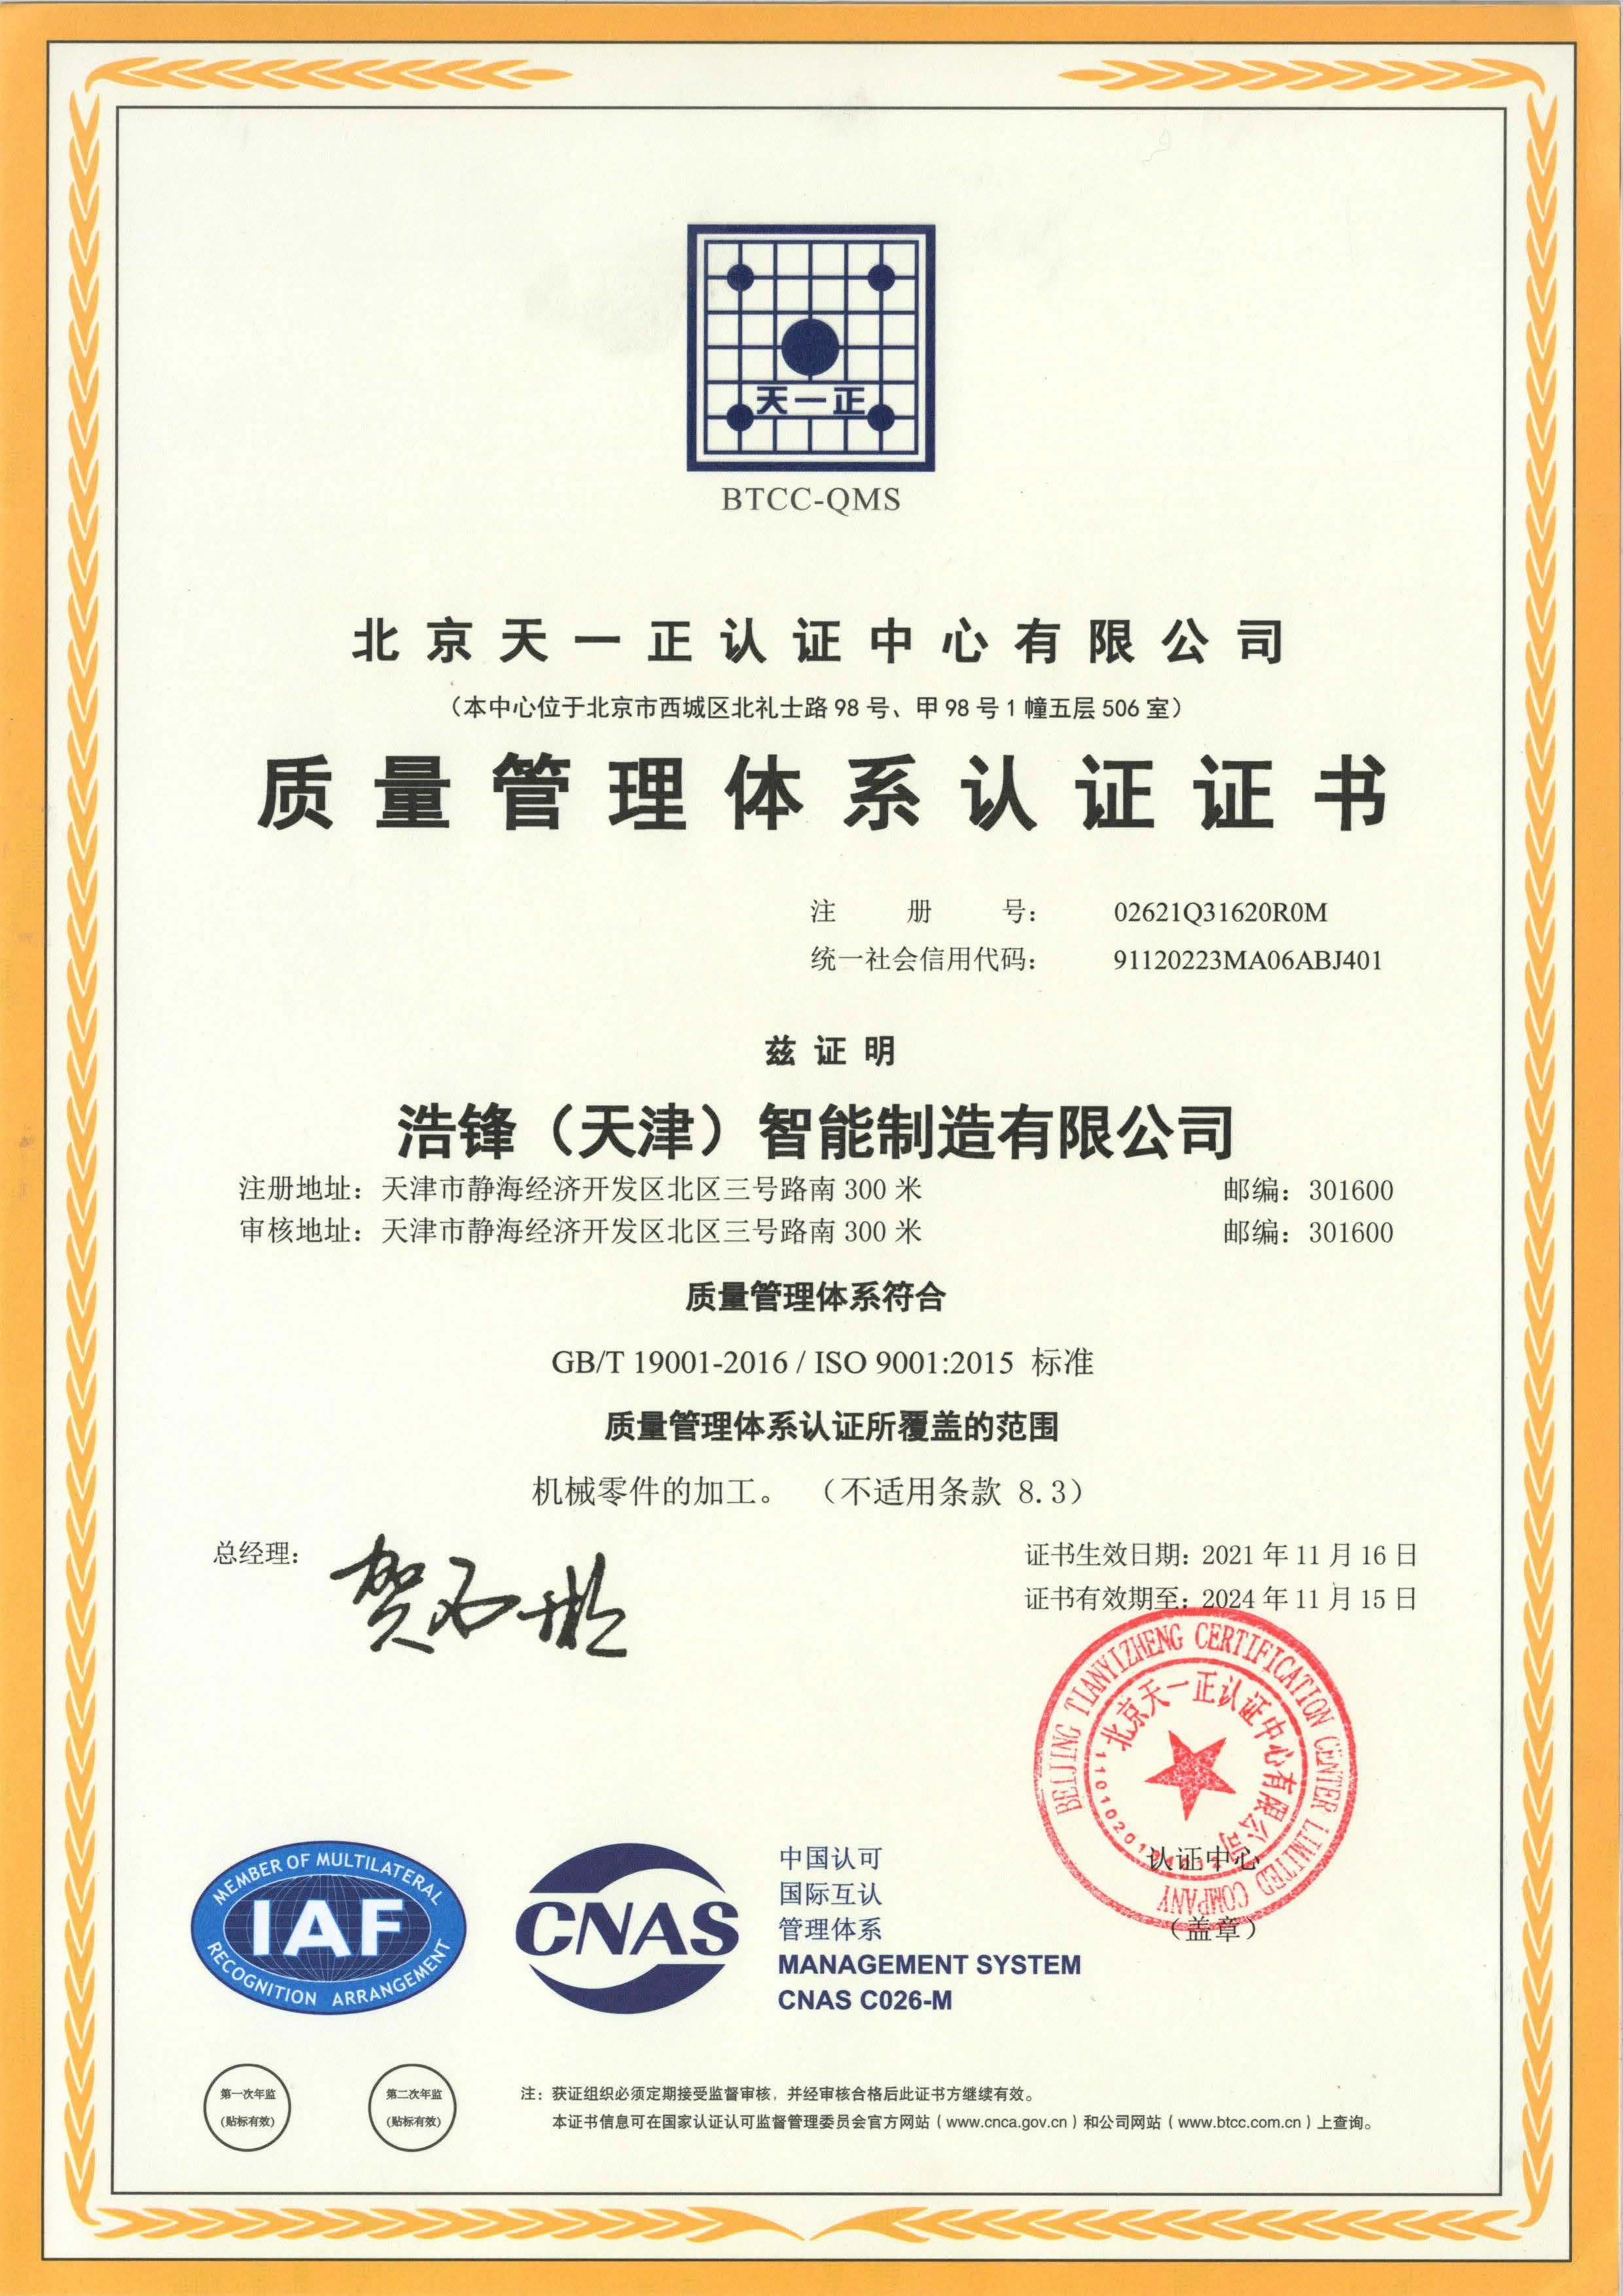 IAF 雄伟ISO9001管理体系证书-中文